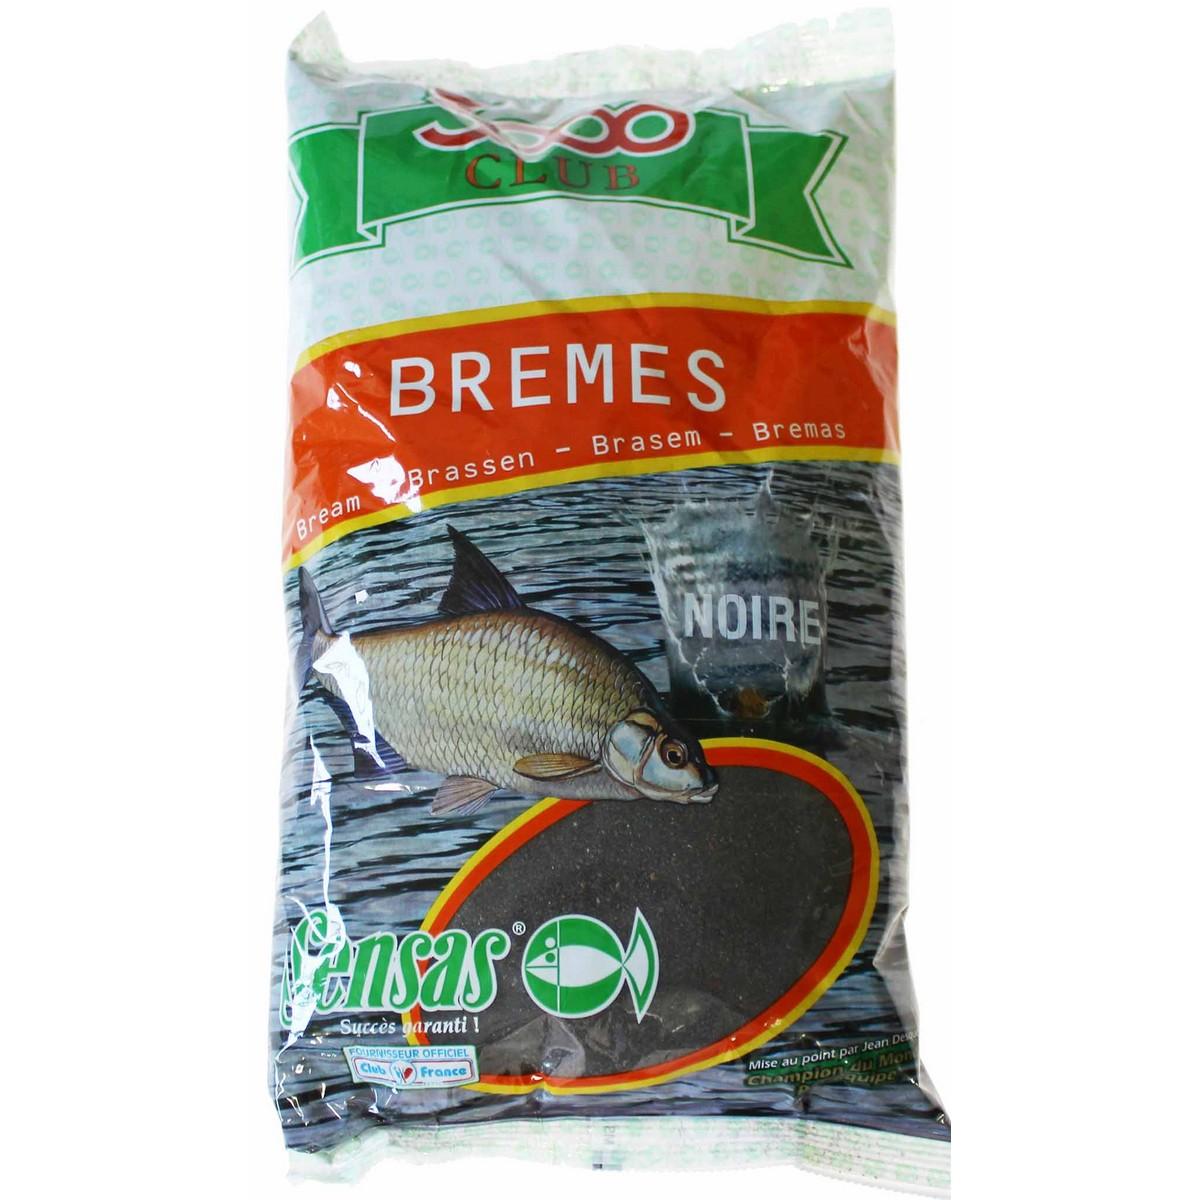 Захранка за риболов Sensas 3000 Club Bremes(Bream) Noir